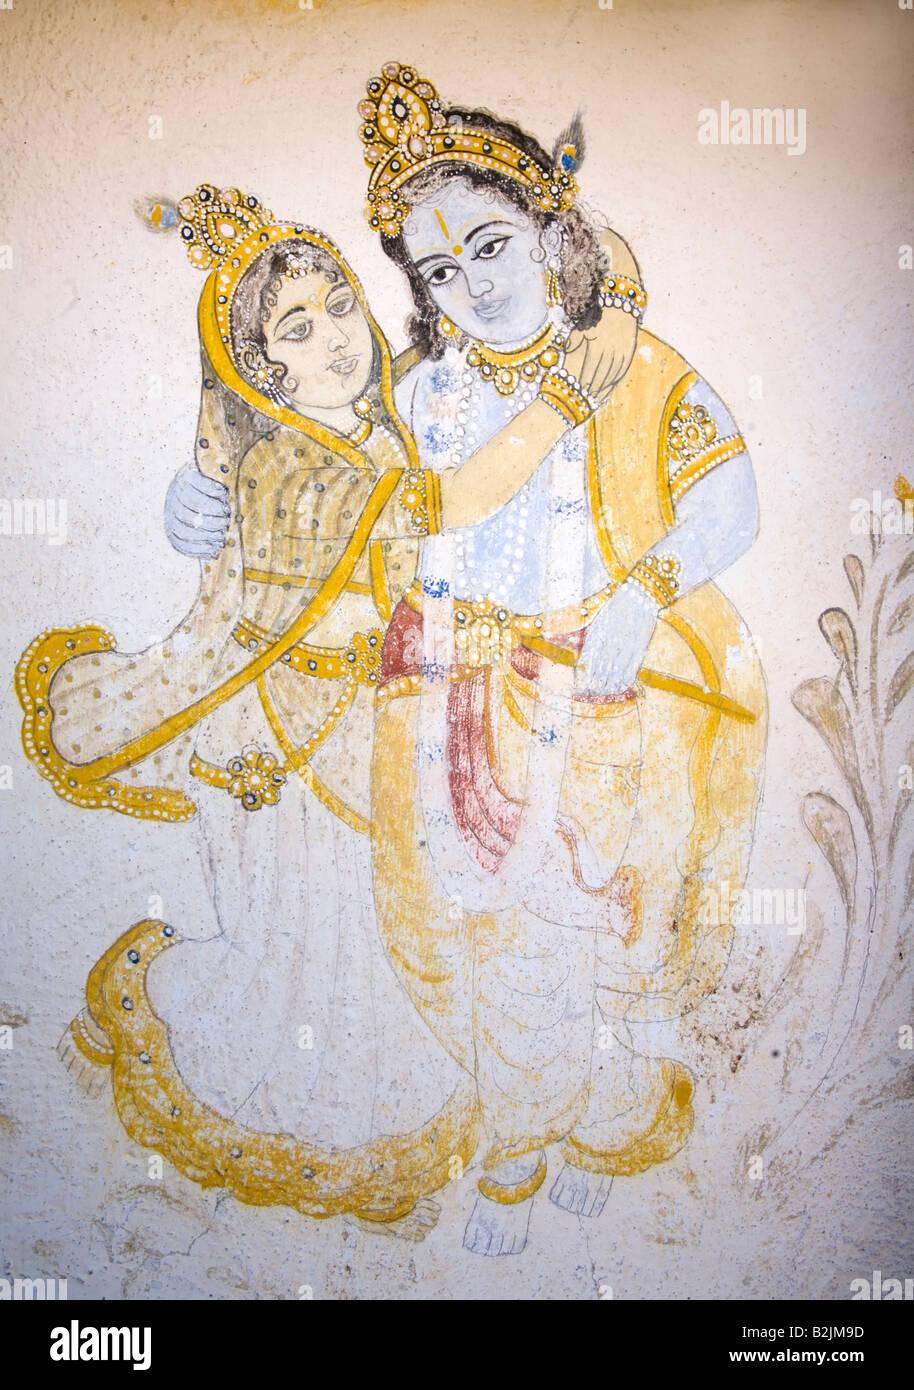 Old Radha Krishna Painting India Stock Photos & Old Radha Krishna ...